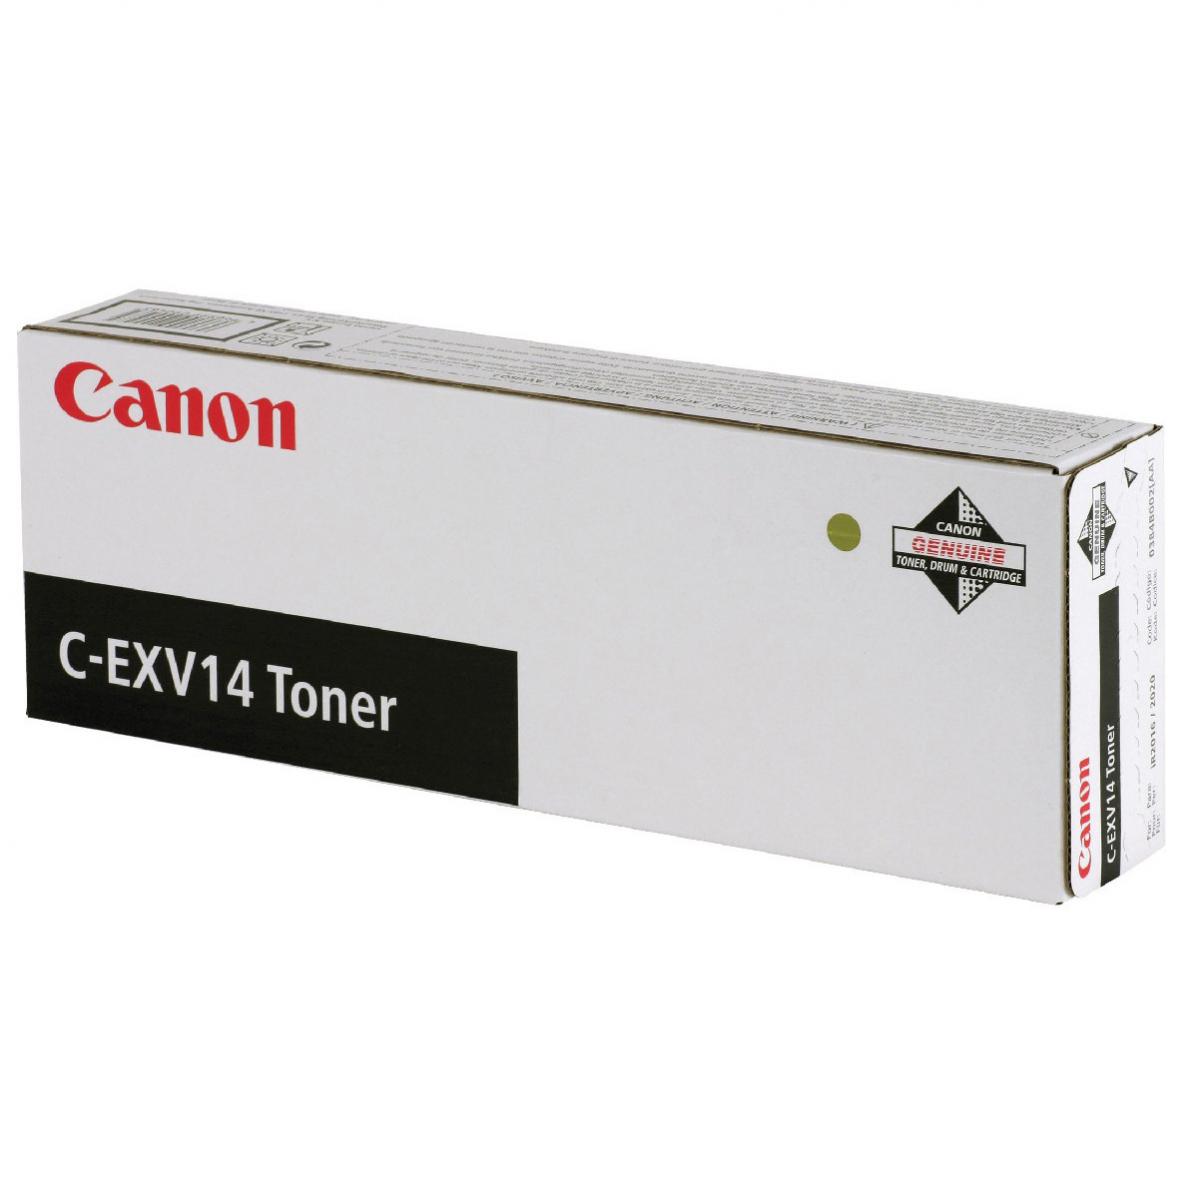 Картридж Canon C-EXV-14/GPR-18/NPG-28 № 0384B003/0384B006 черный